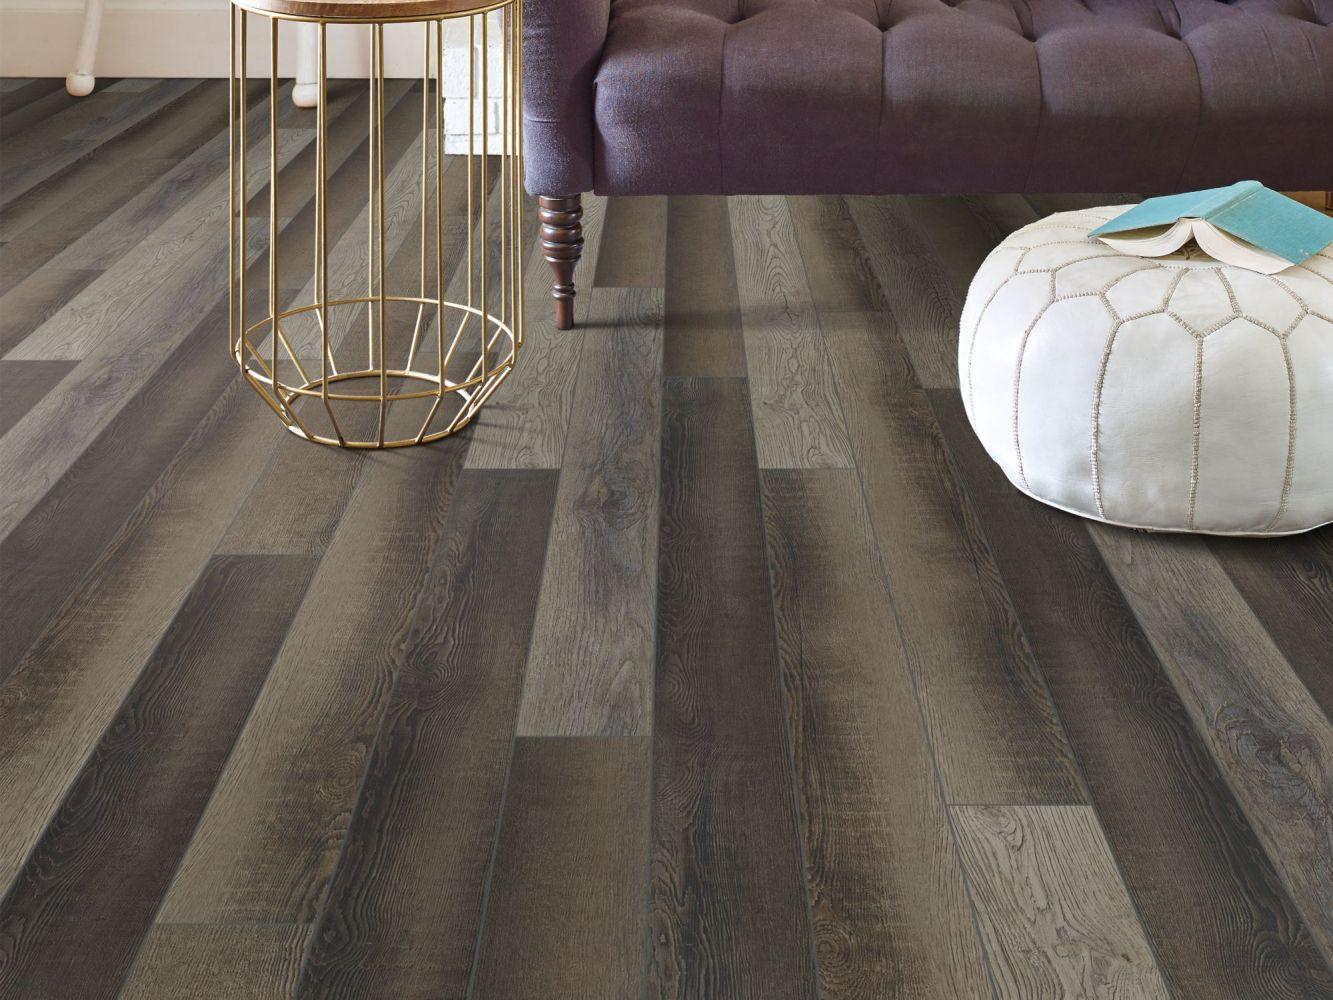 Shaw Floors Reality Homes Fremont 5″ Blackfill Oak 00909_106RH